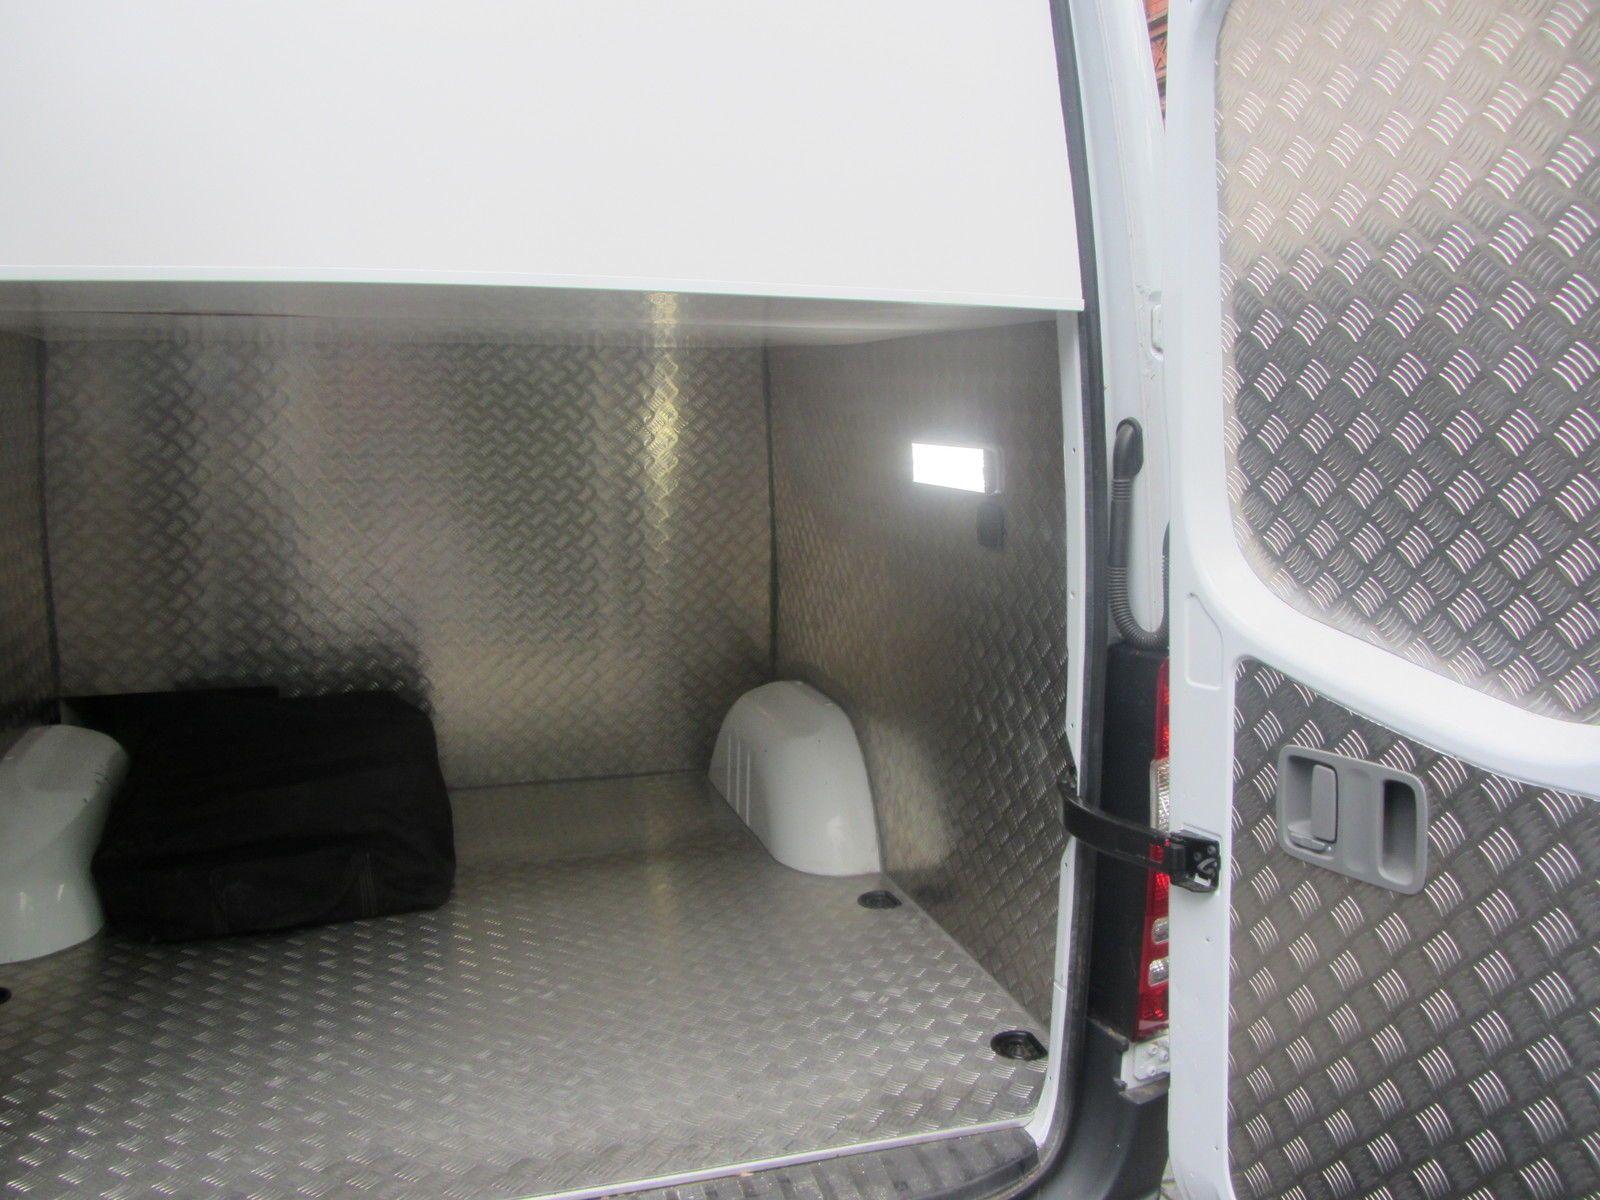 Mercedes Sprinter 313 CDI Sportshome Camper Van Conversion Race 4 Berth In Cars Motorcycles